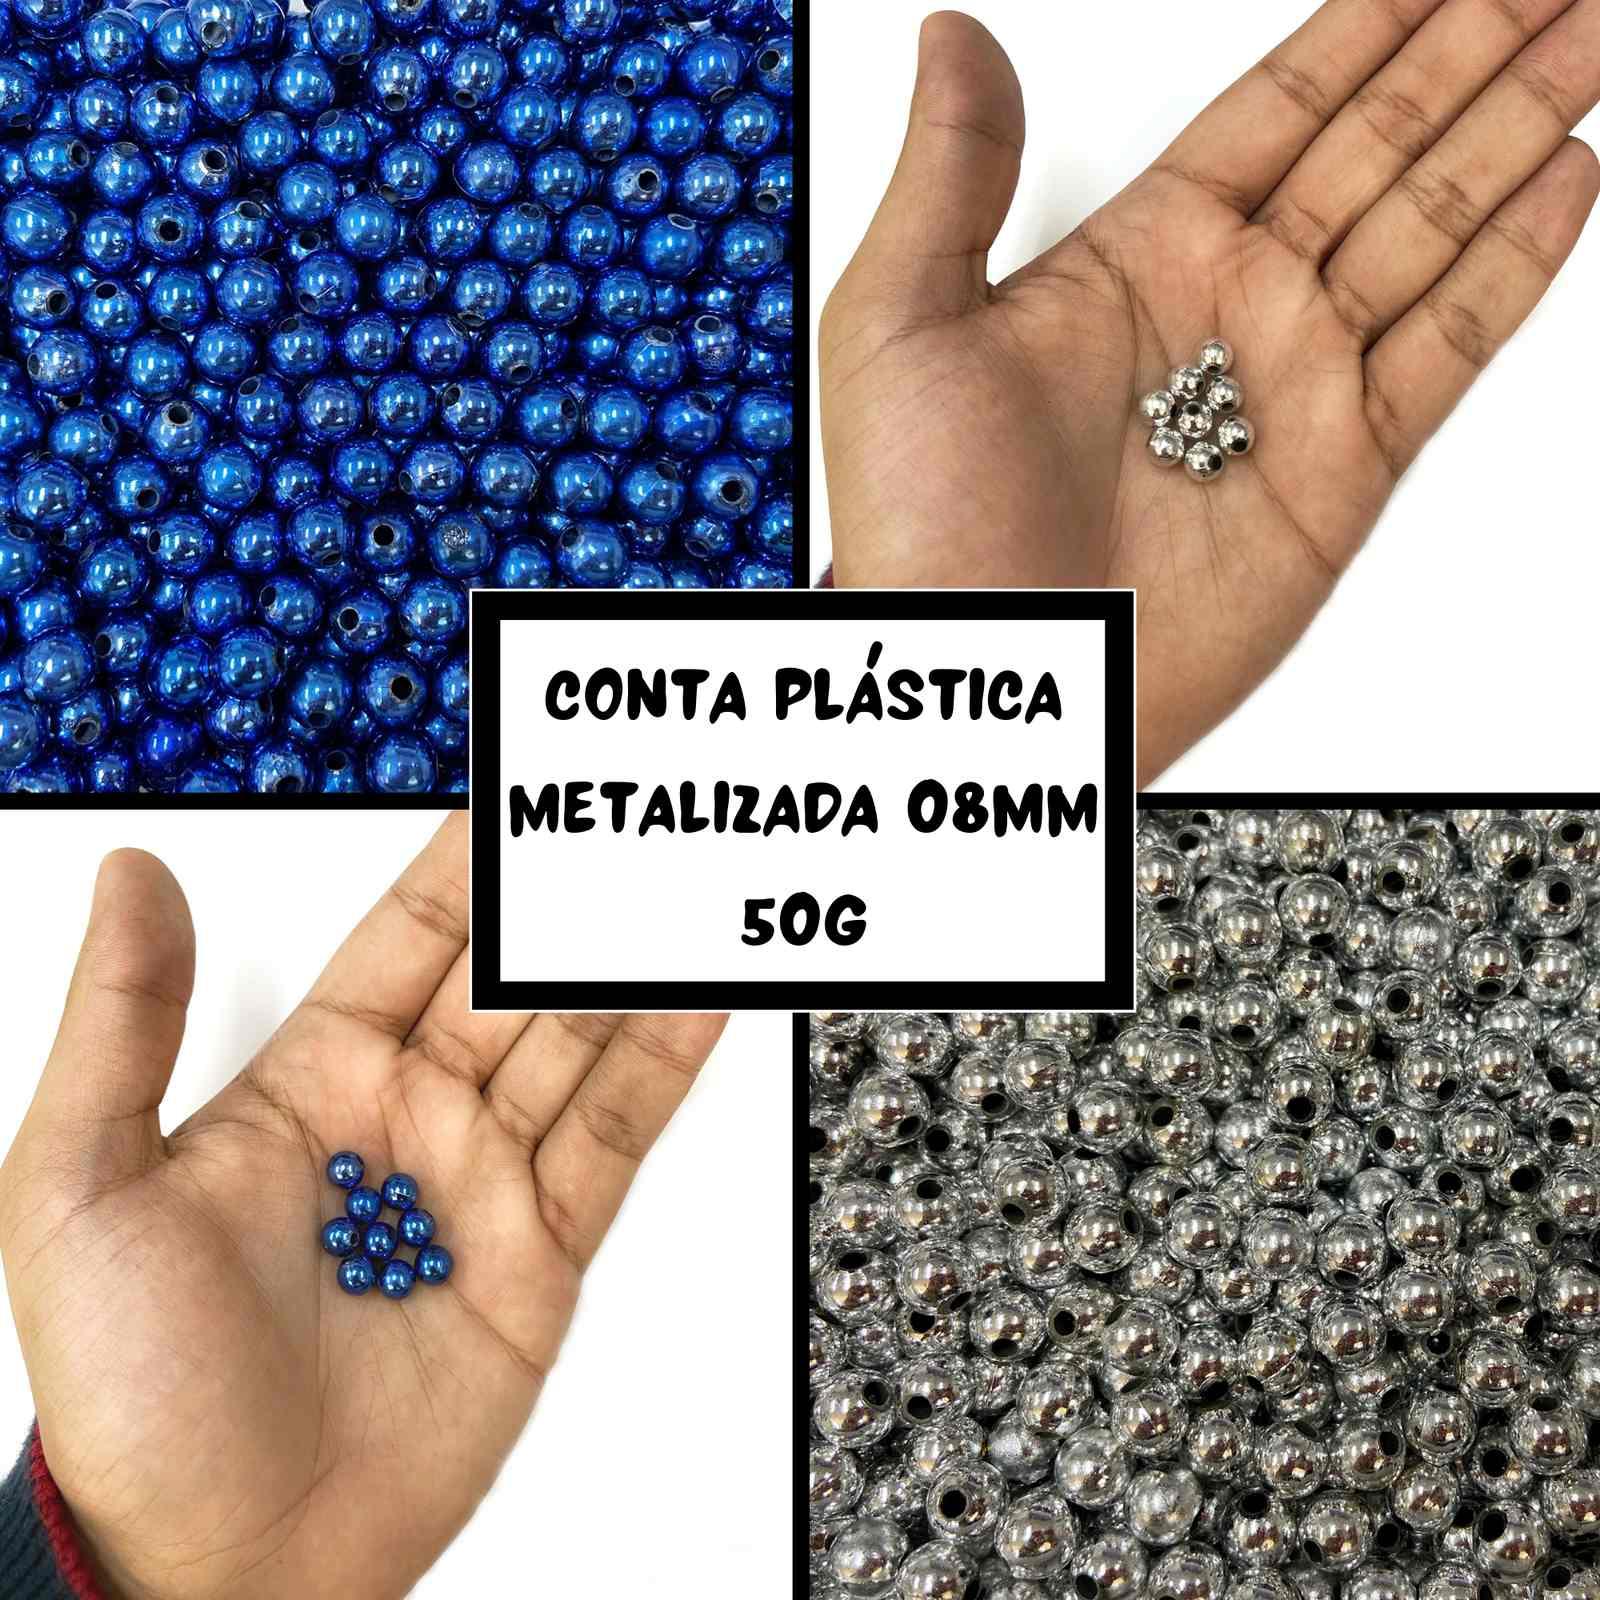 Conta Plástica Metalizada 08mm - 50g